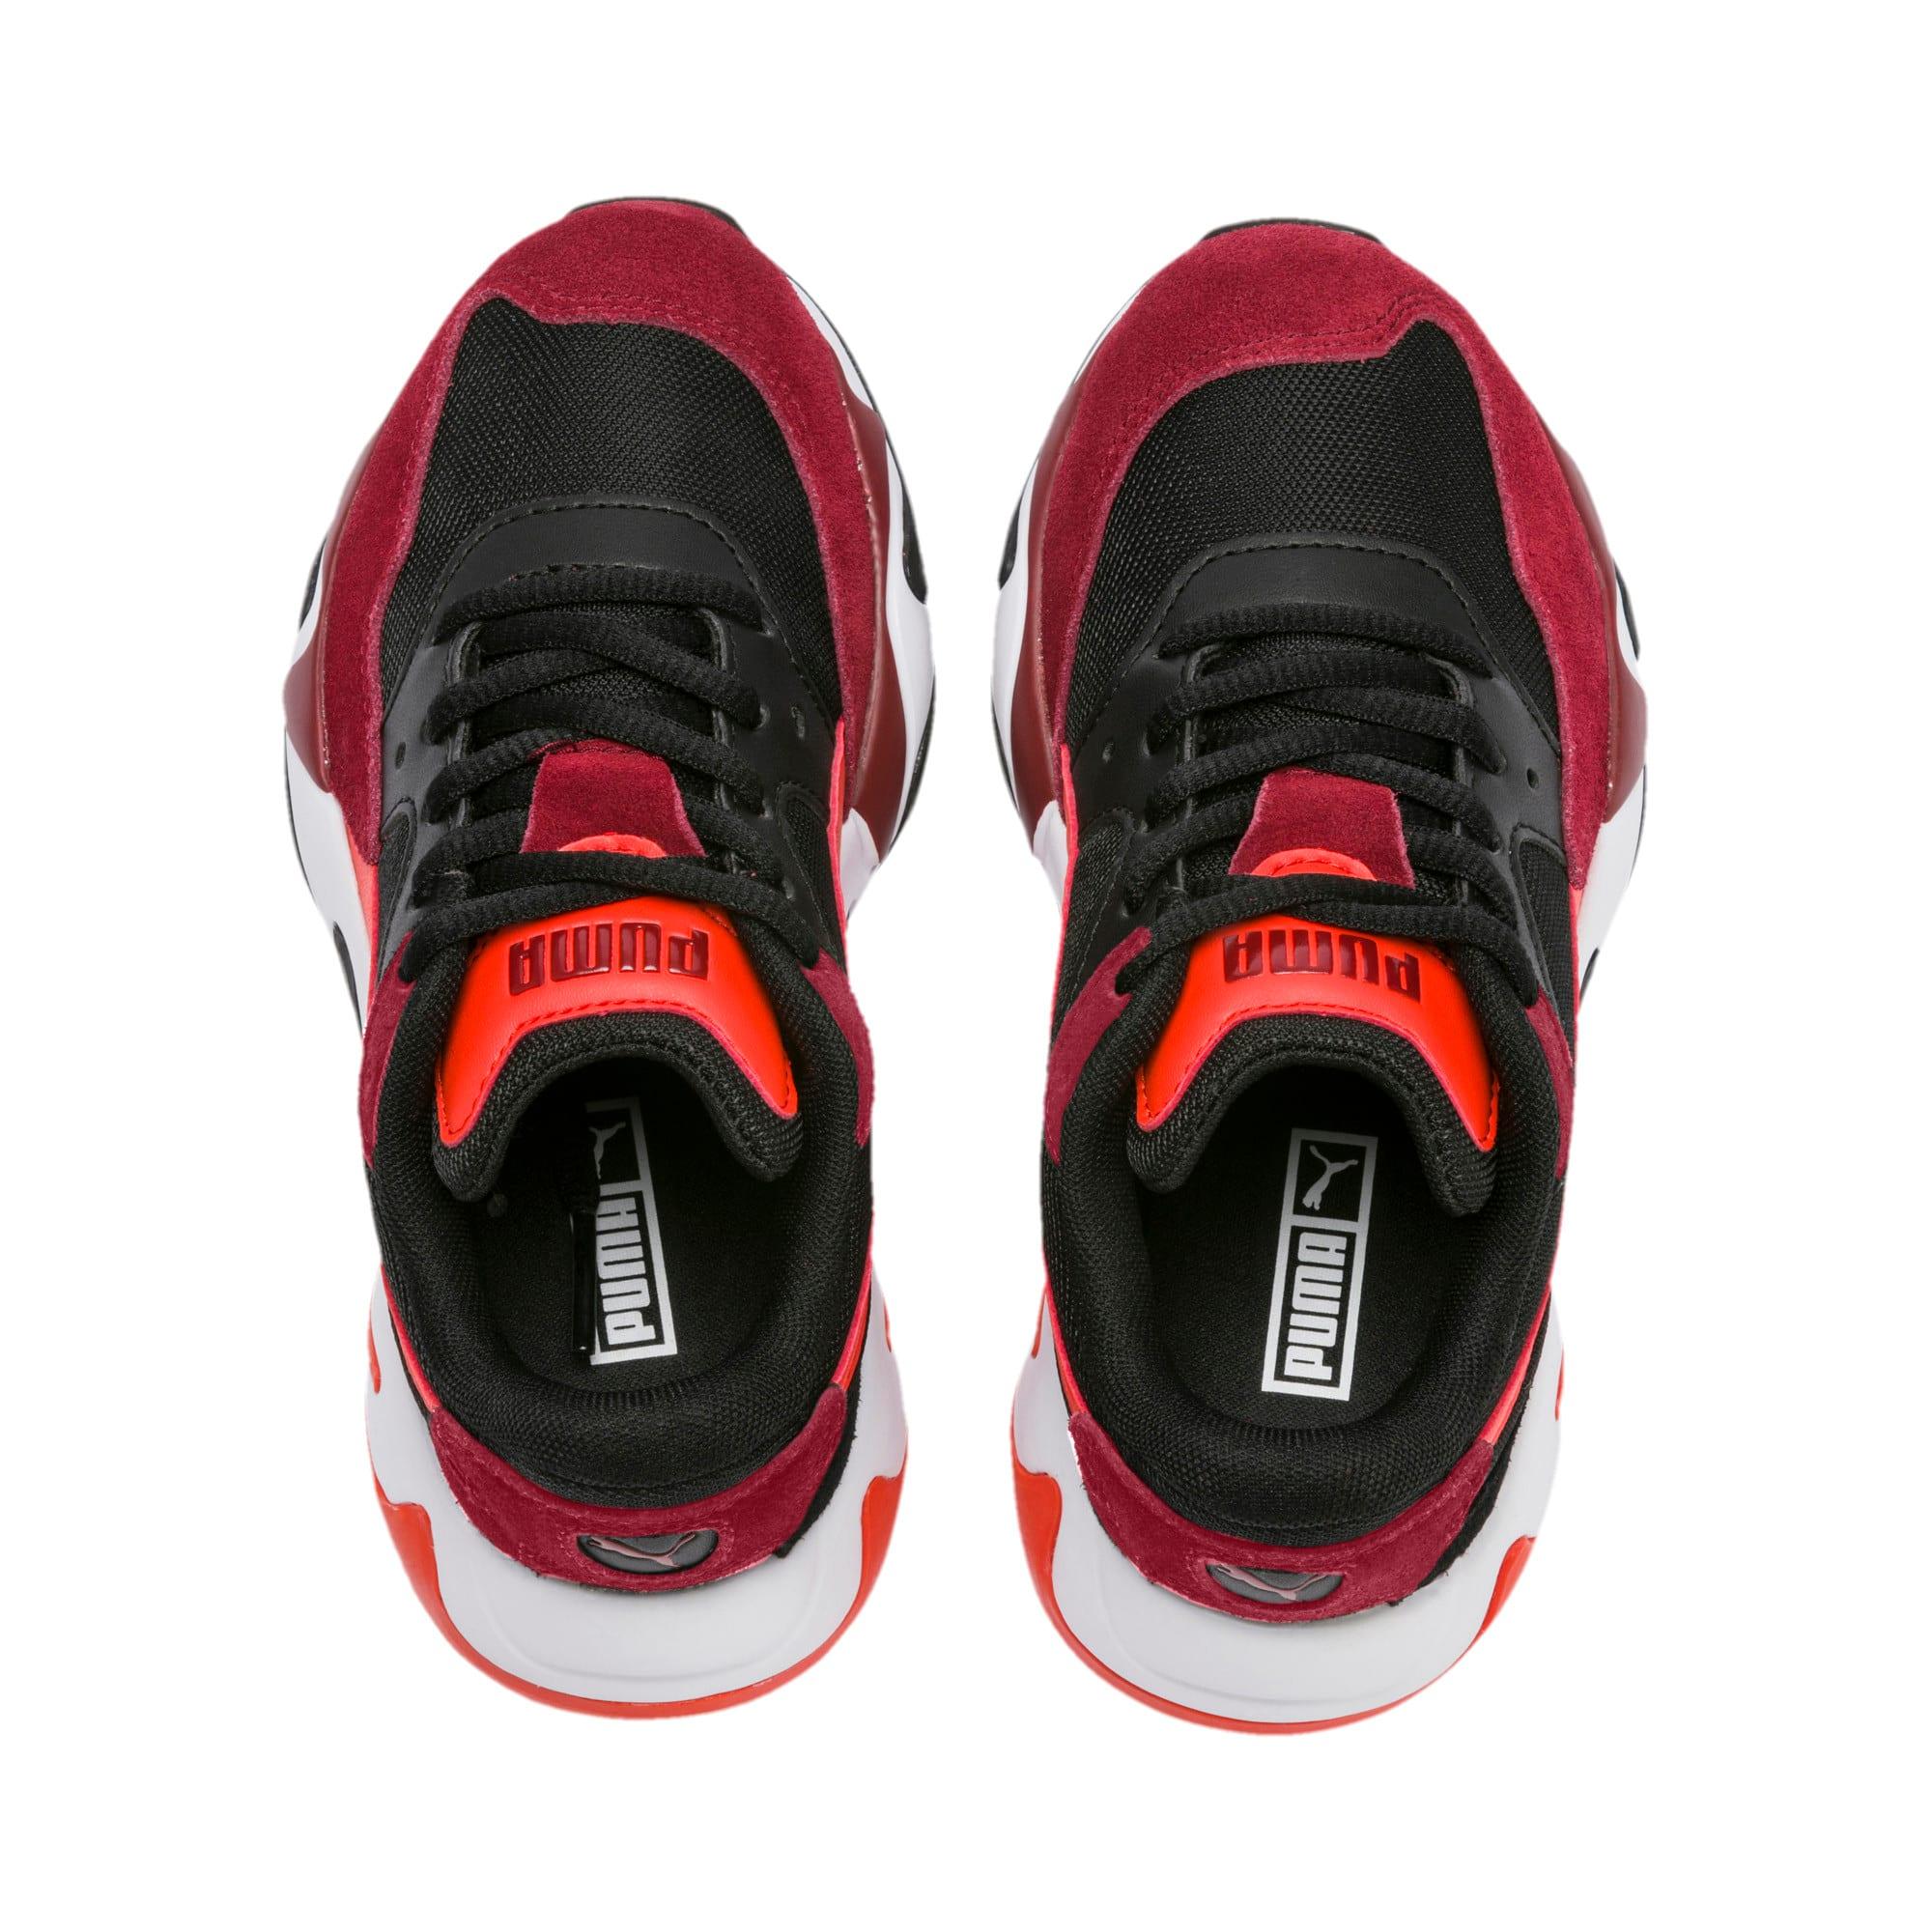 Miniatura 6 de Zapatos Storm Ray para niño pequeño, Rhubarb-Puma Black, mediano